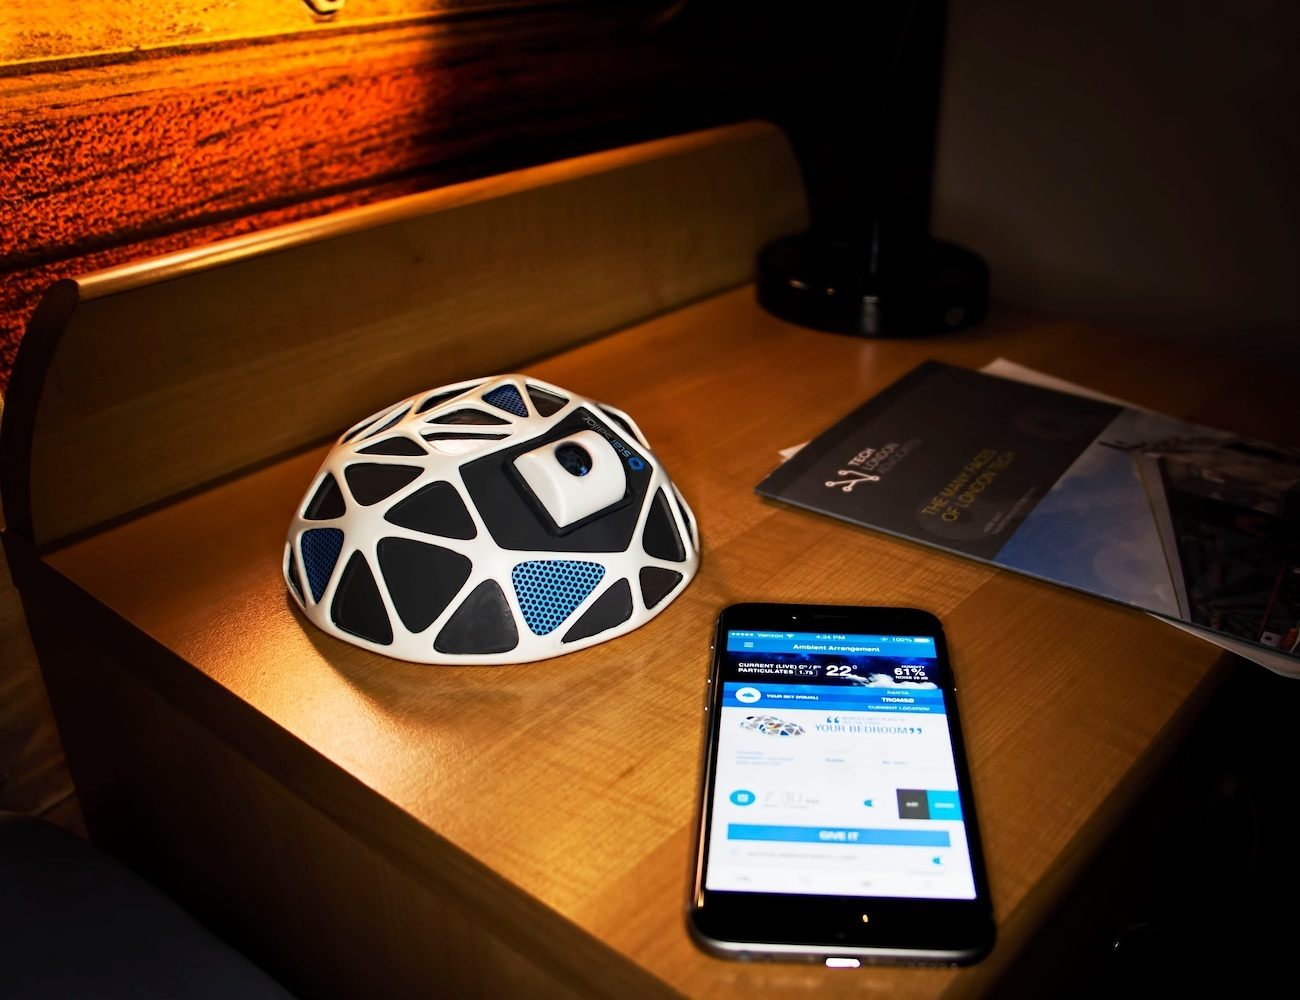 StarSailor Ambient Space Sleep Projector